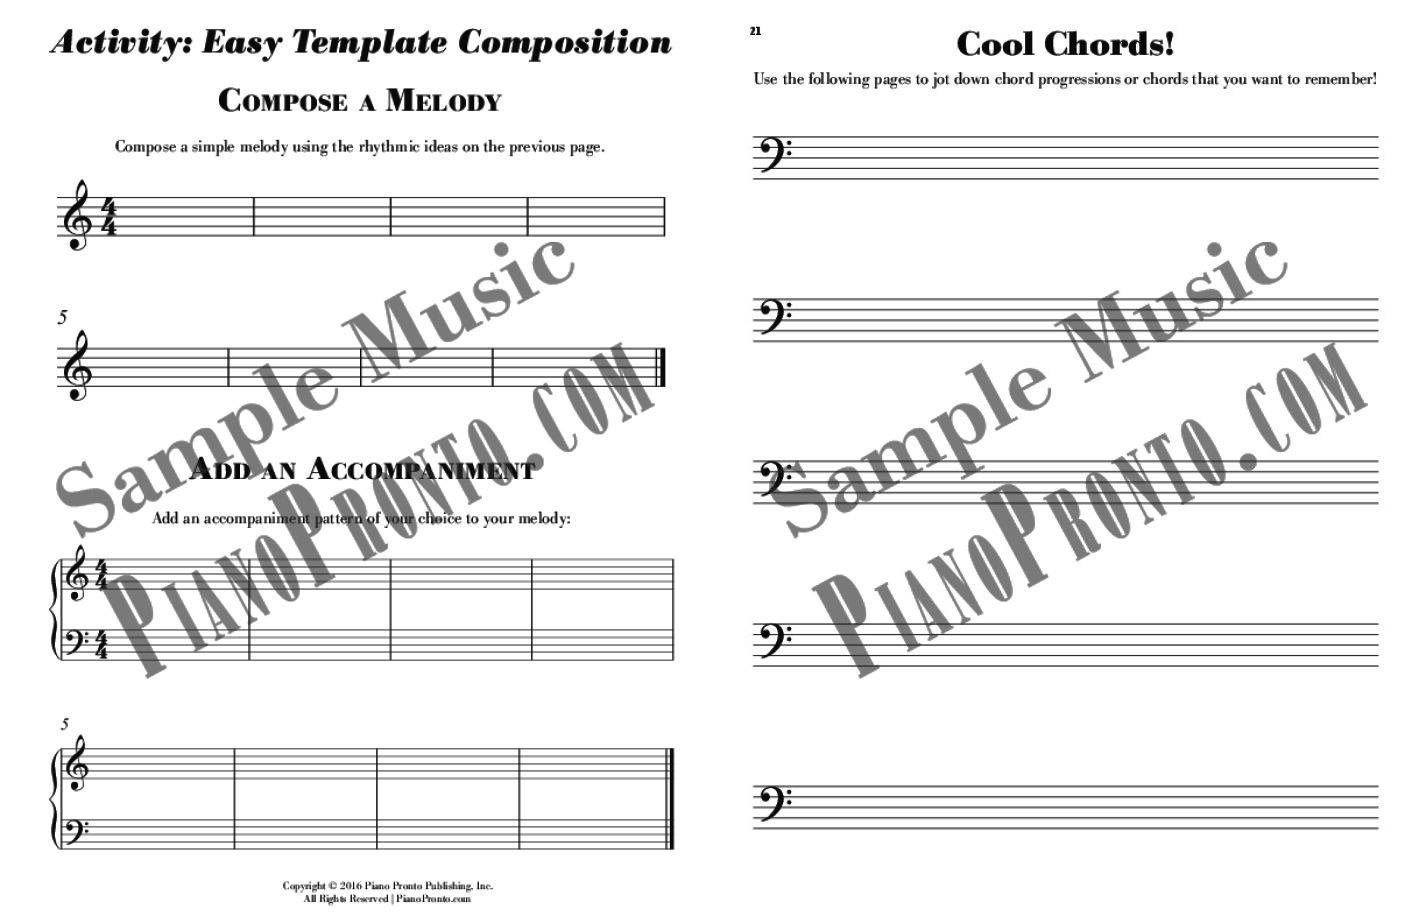 Write That Down! - Composition Workbook | Workbook | Piano Pronto ...